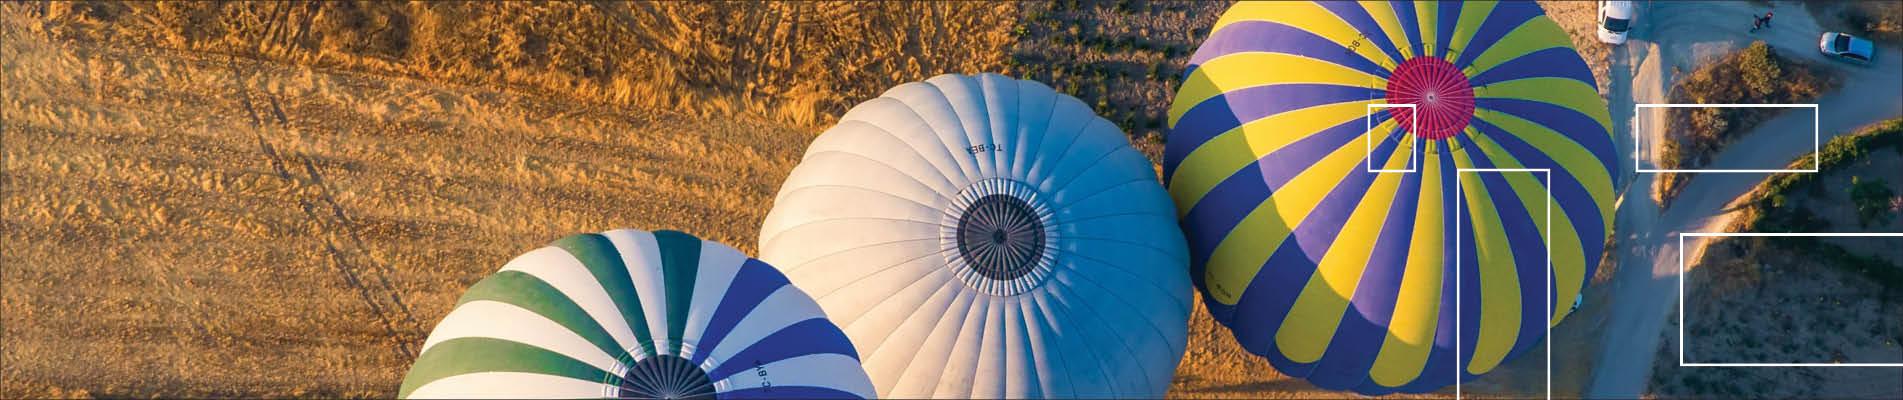 balloons soaring over landscape